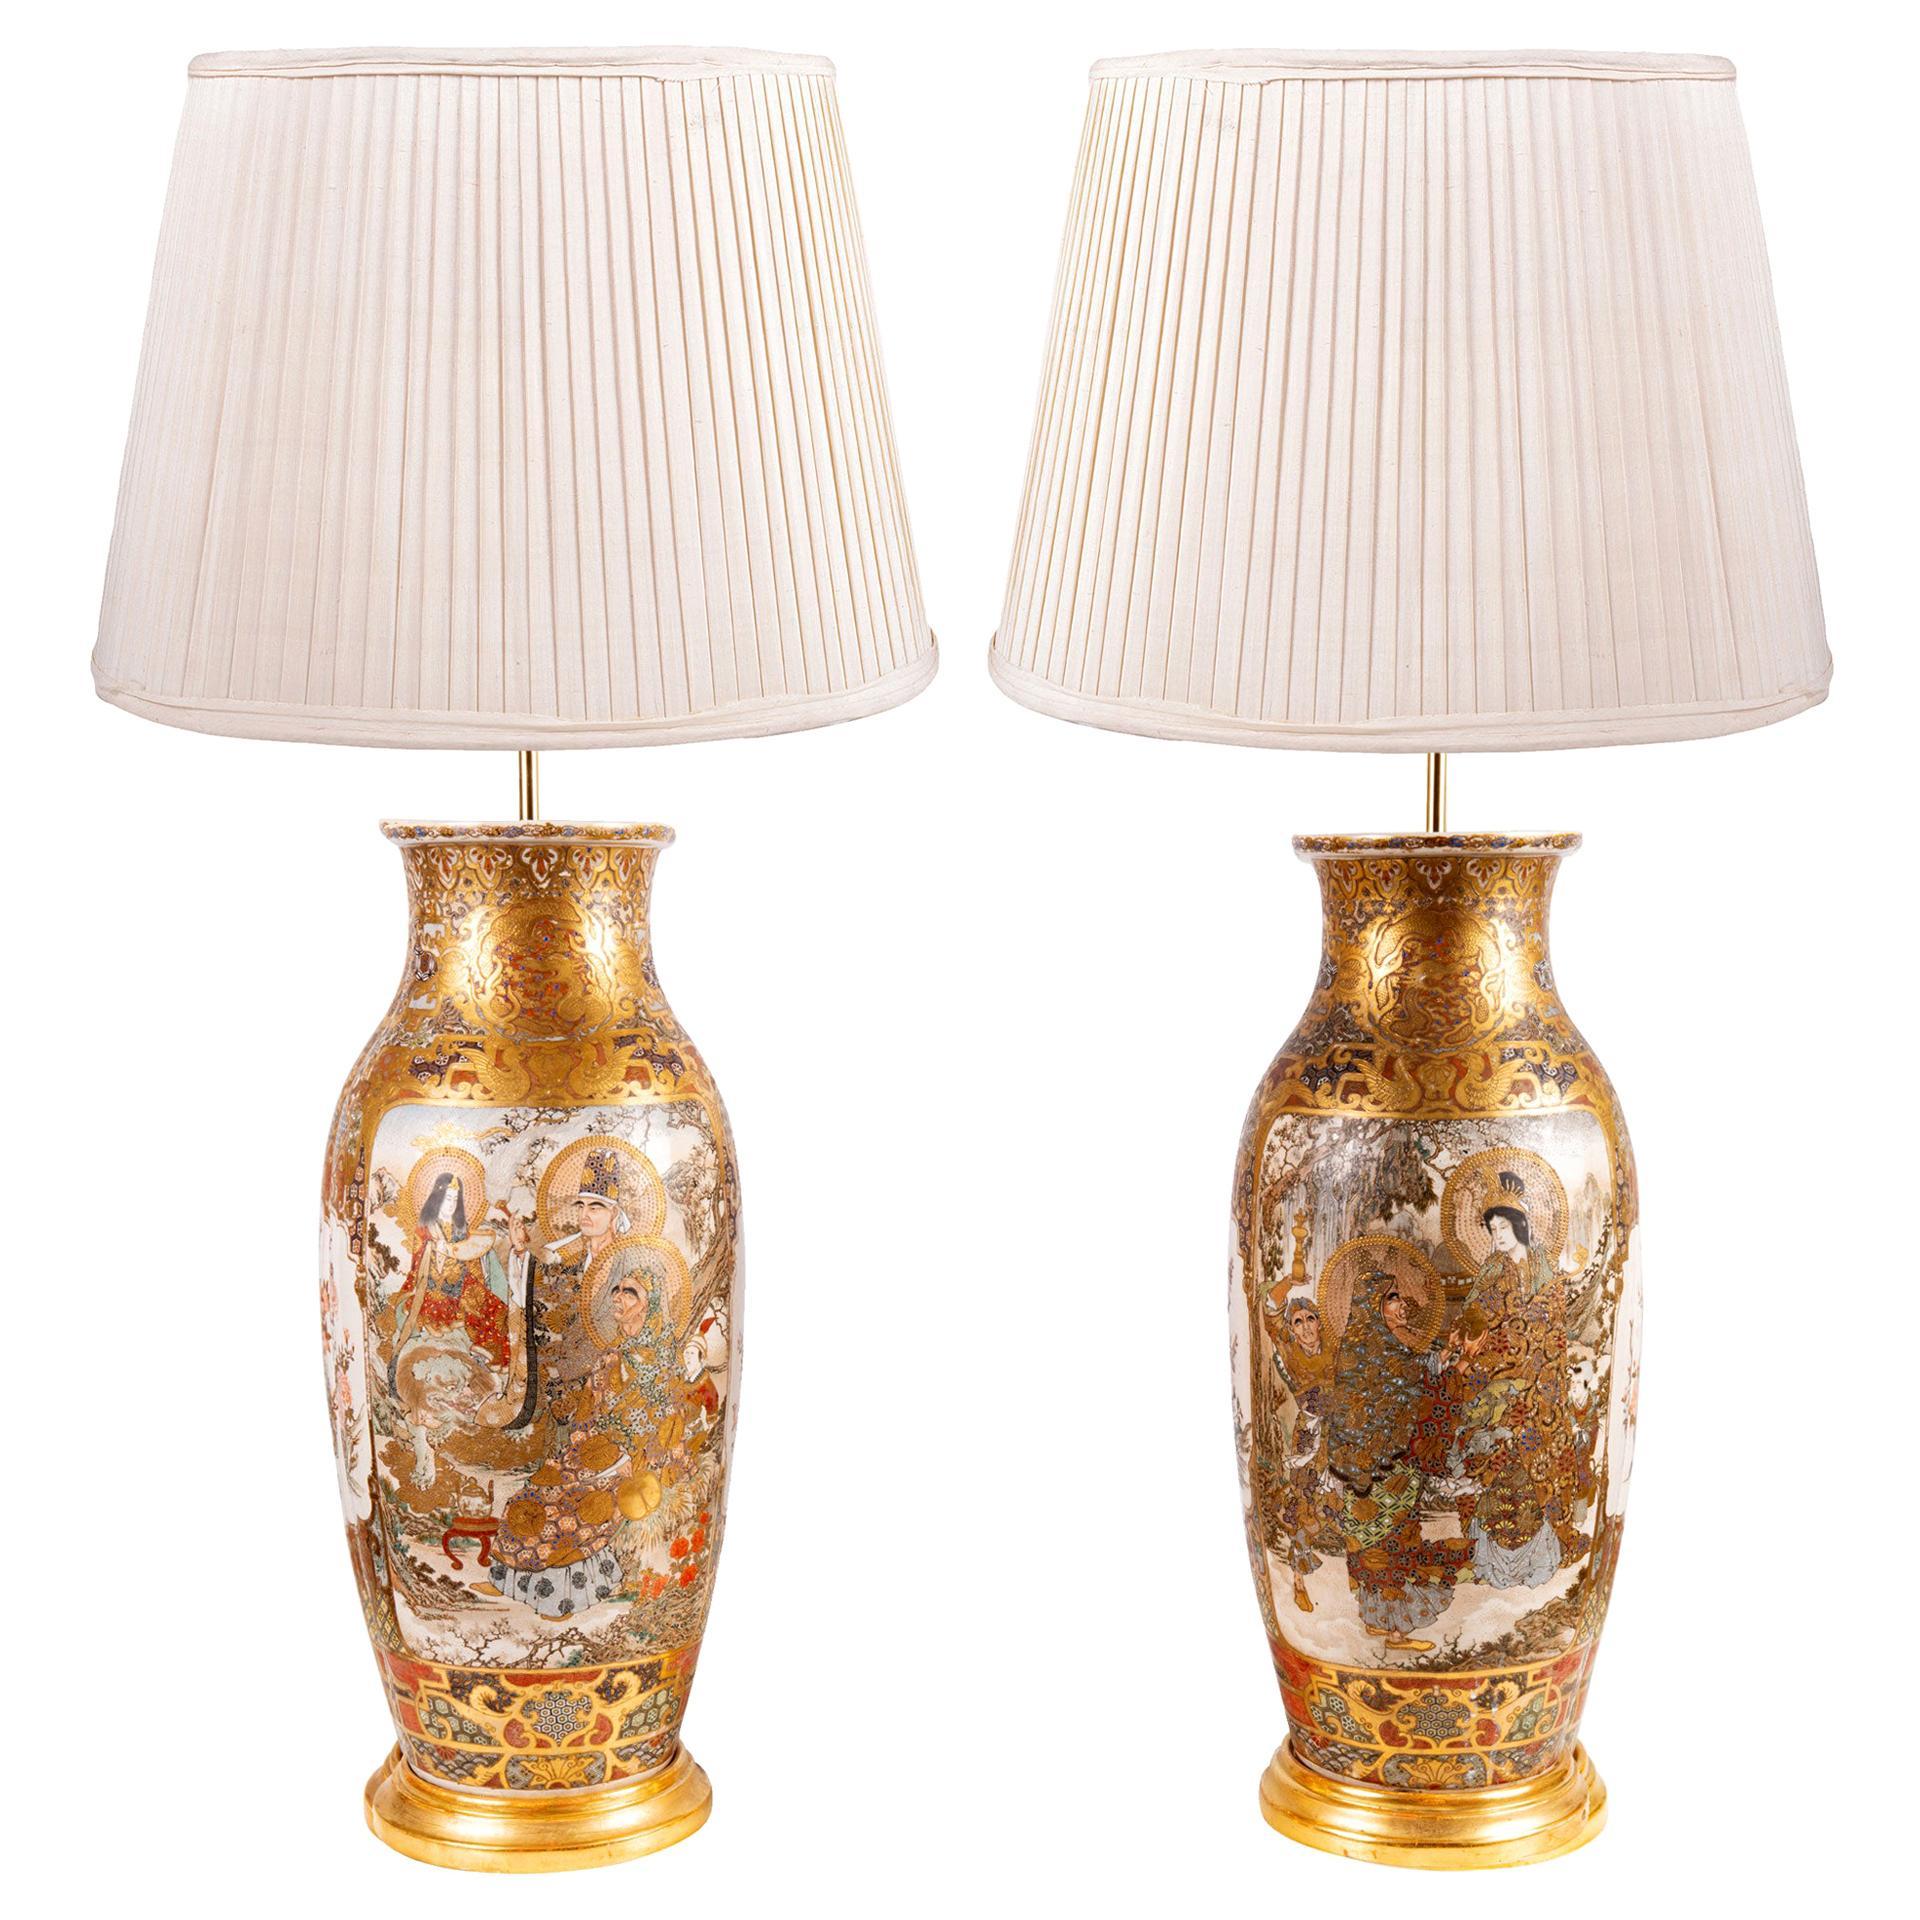 Fine Pair of Japanese Satsuma Vases / Lamps, 19th Century Vases